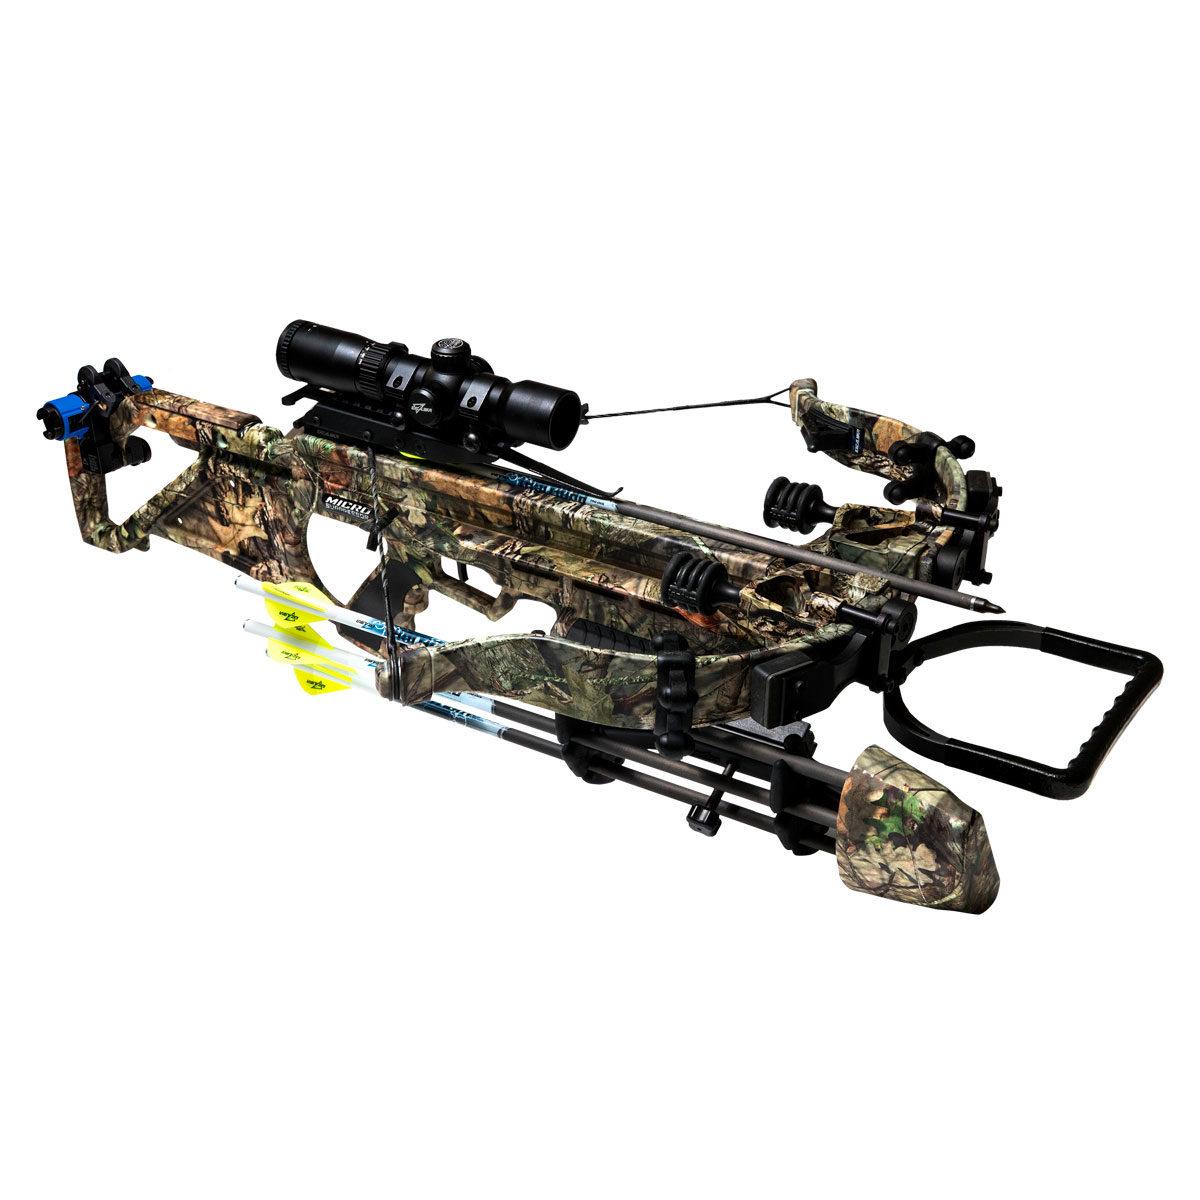 Excalibur Micro Suppressor 400 TD Crossbow